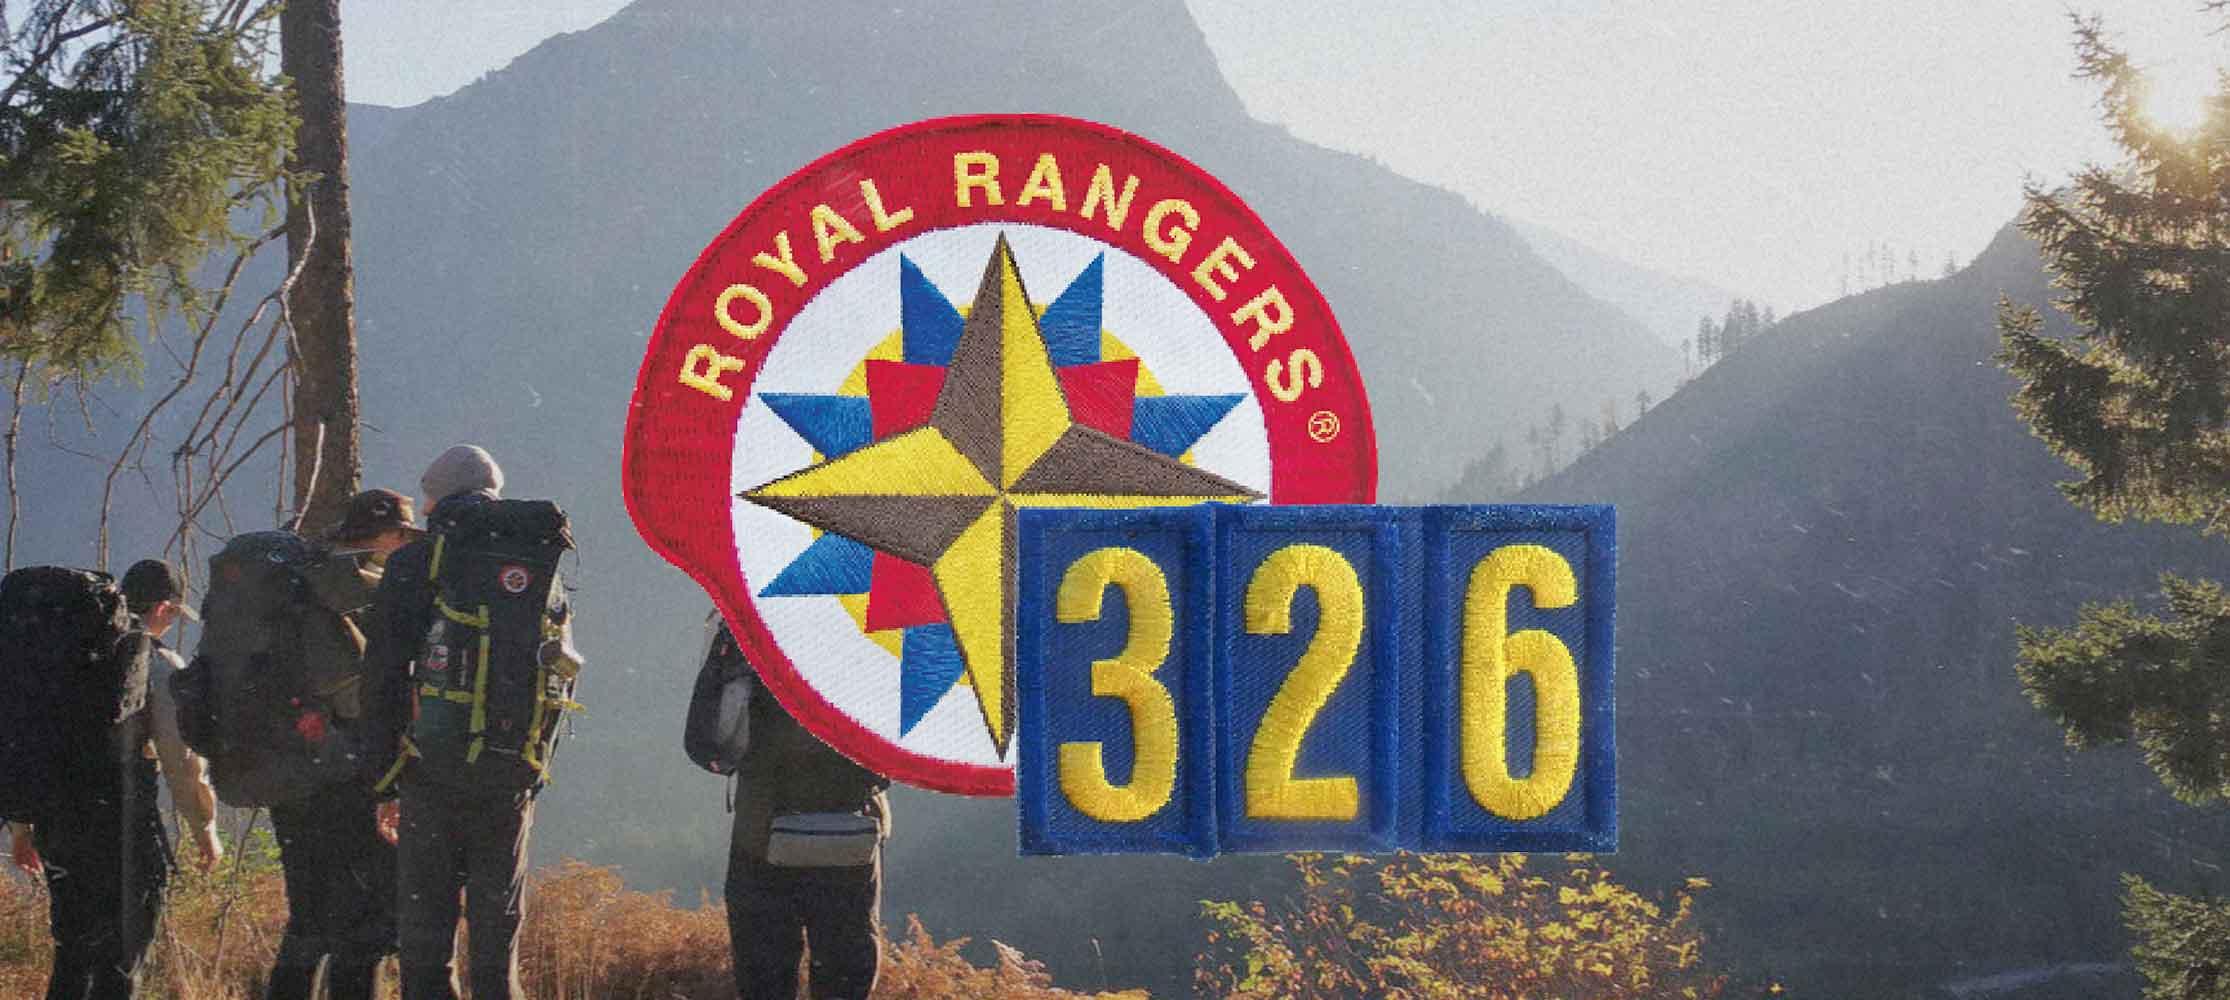 Royal Ranger Erkrath